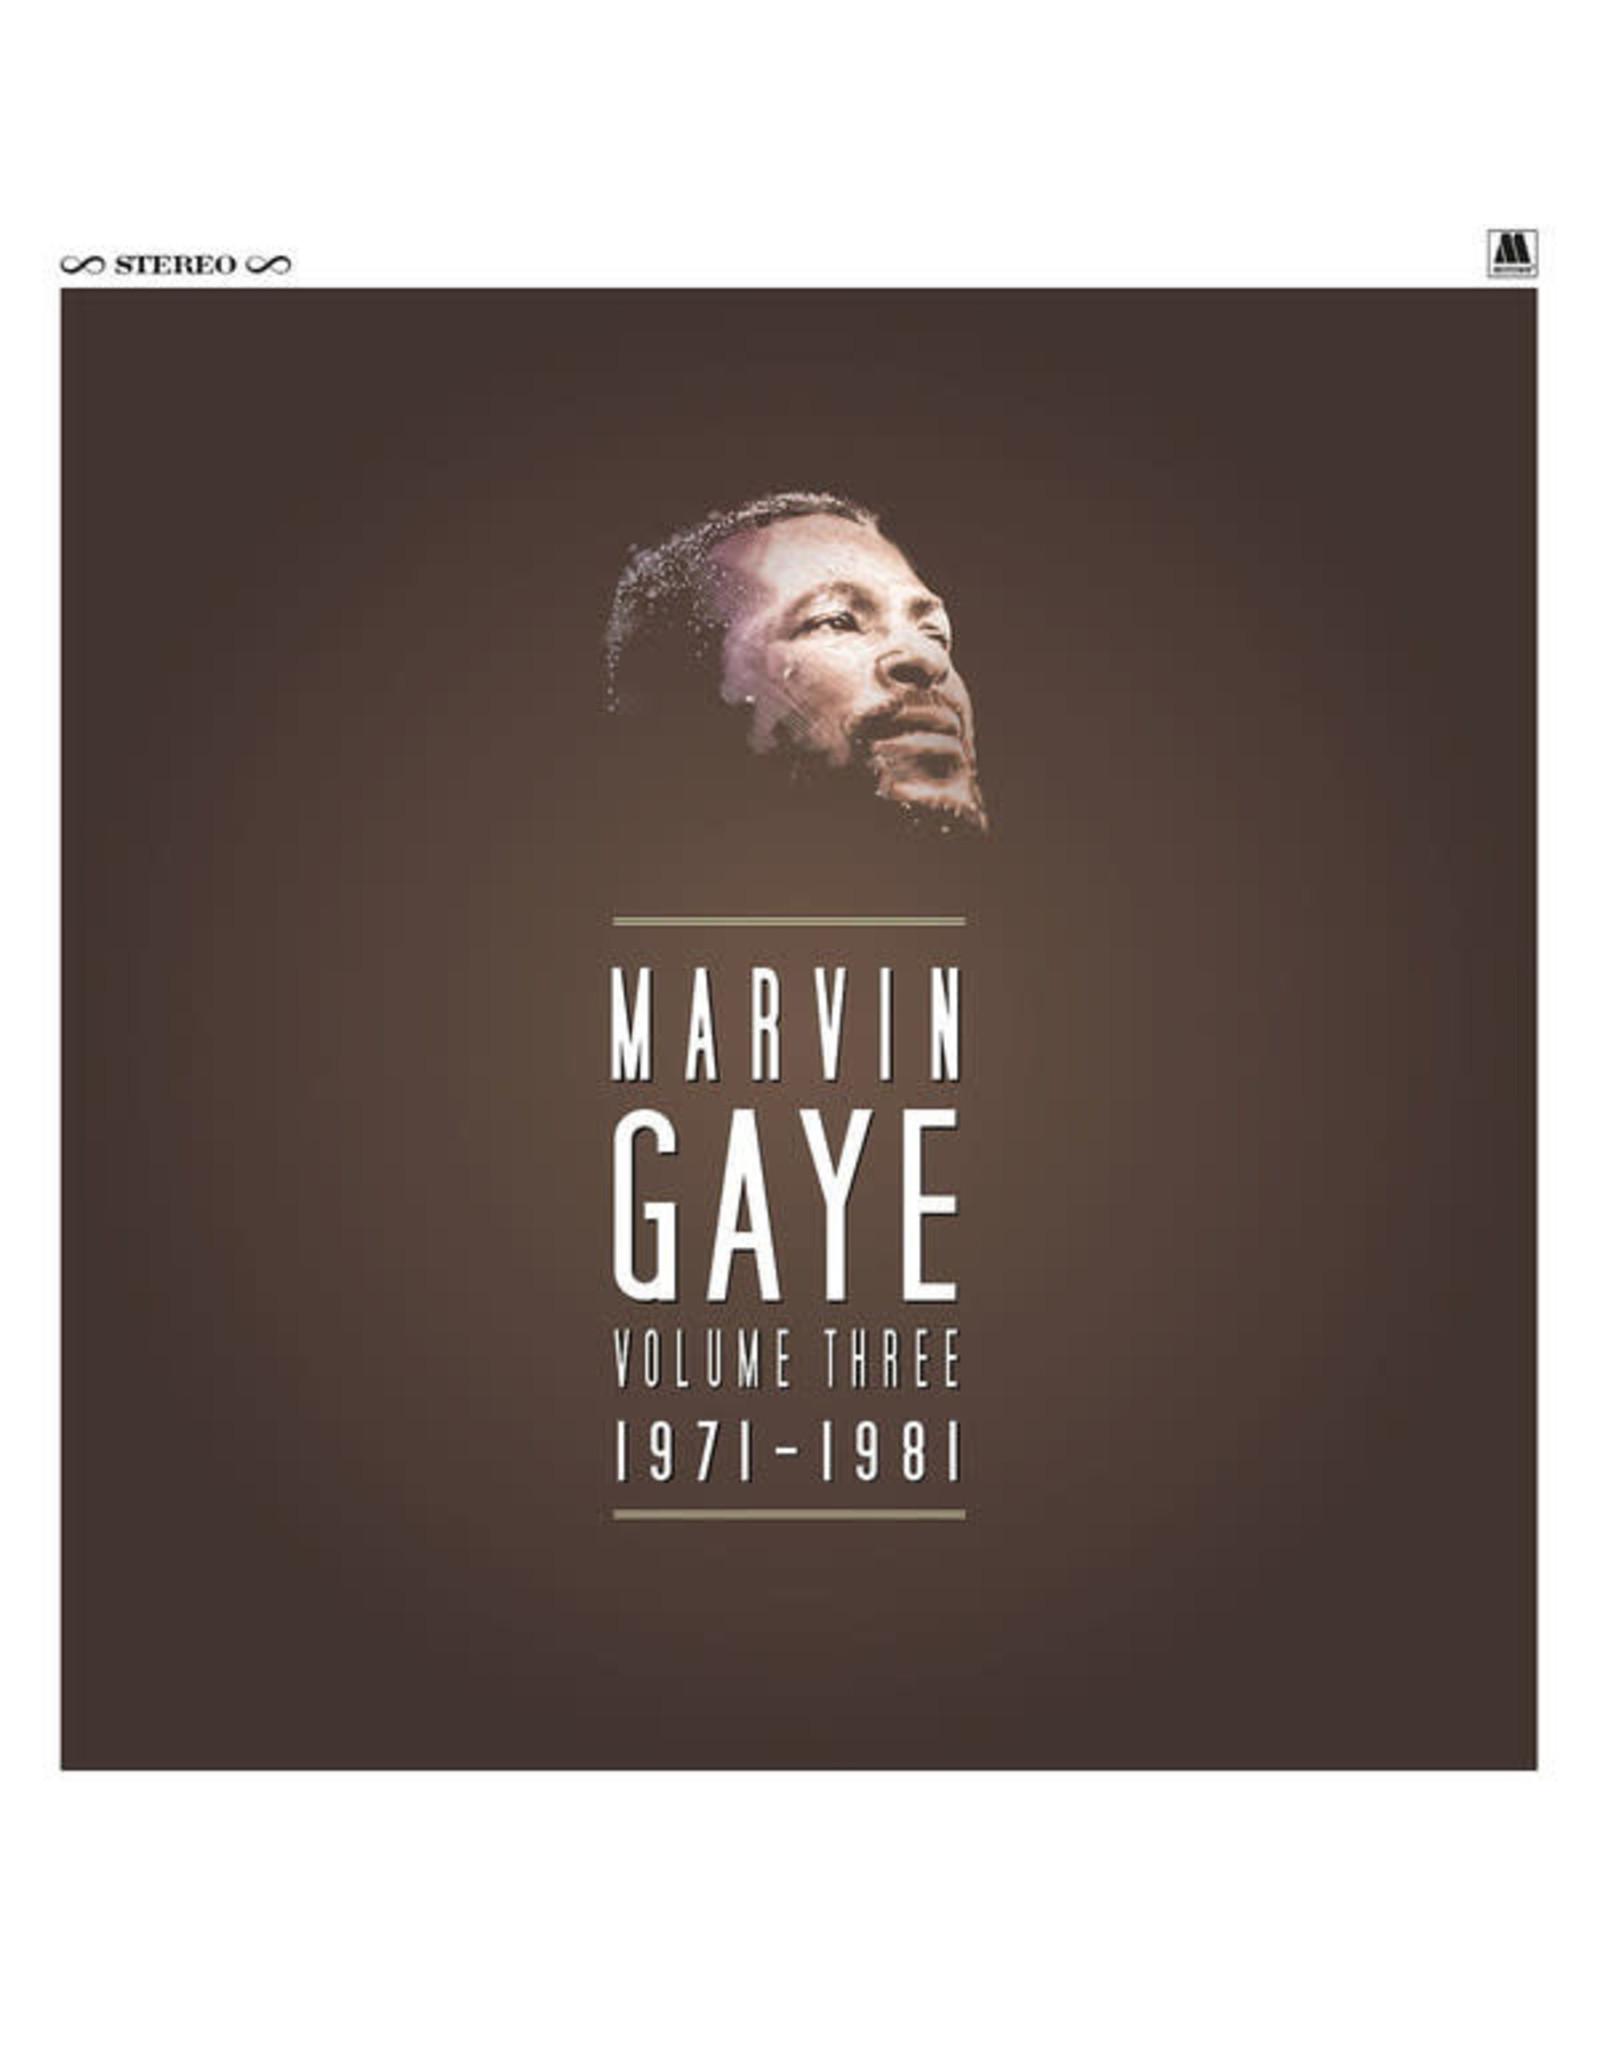 Gaye, Marvin - Volume Three (1971-1981) LP Box Set